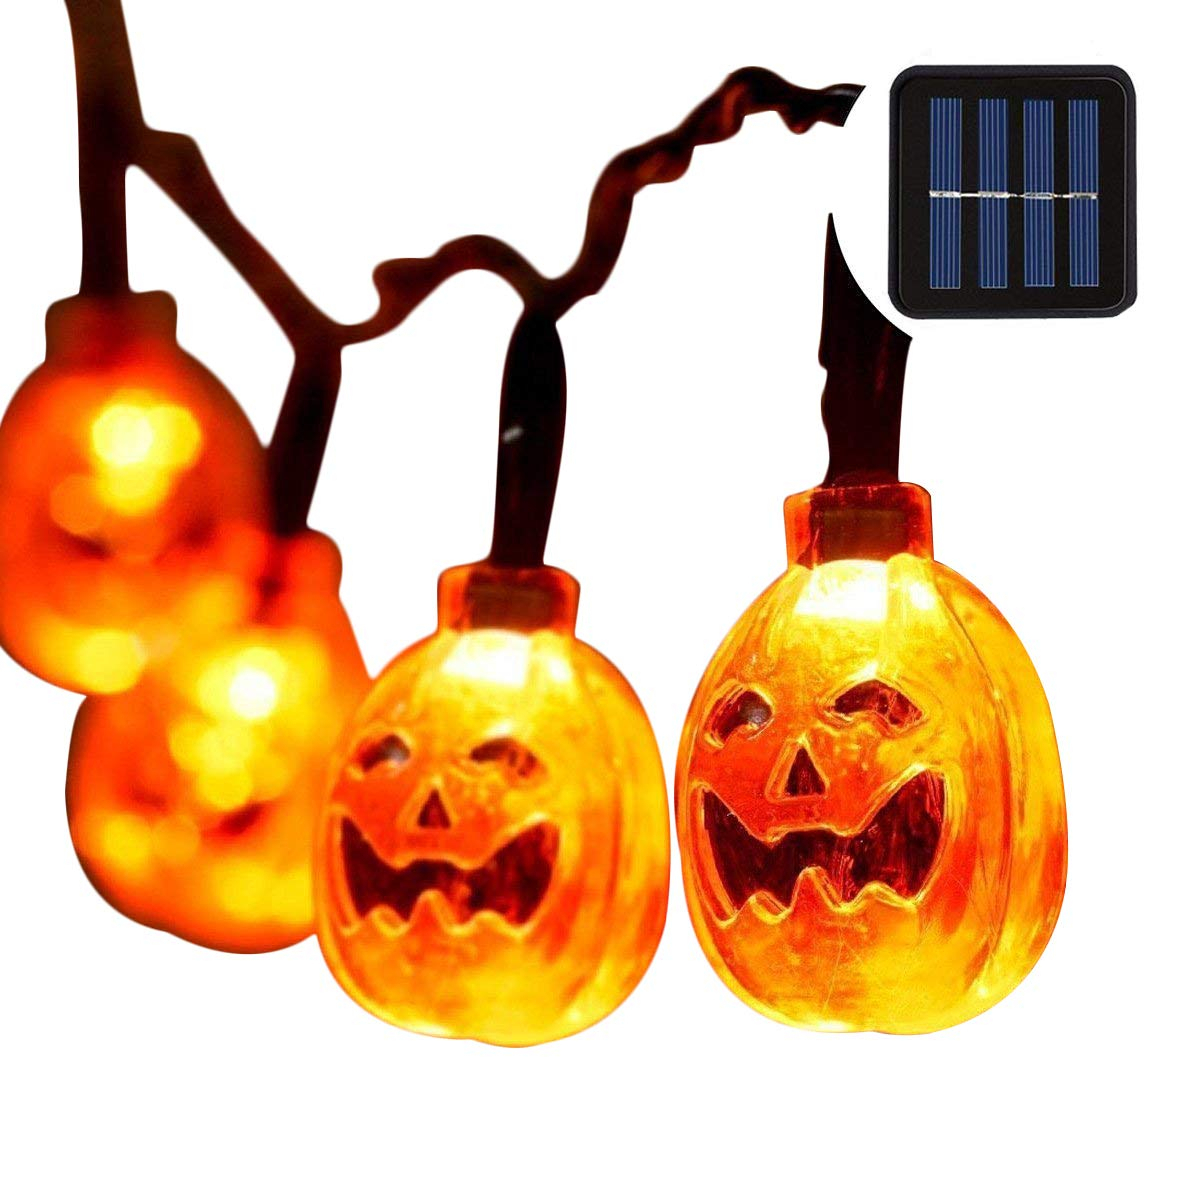 Binval Halloween Pumpkin String Lights 20/30/50LED Solar Powered Outdoor Waterproof Light for Home Patio Garden Yard